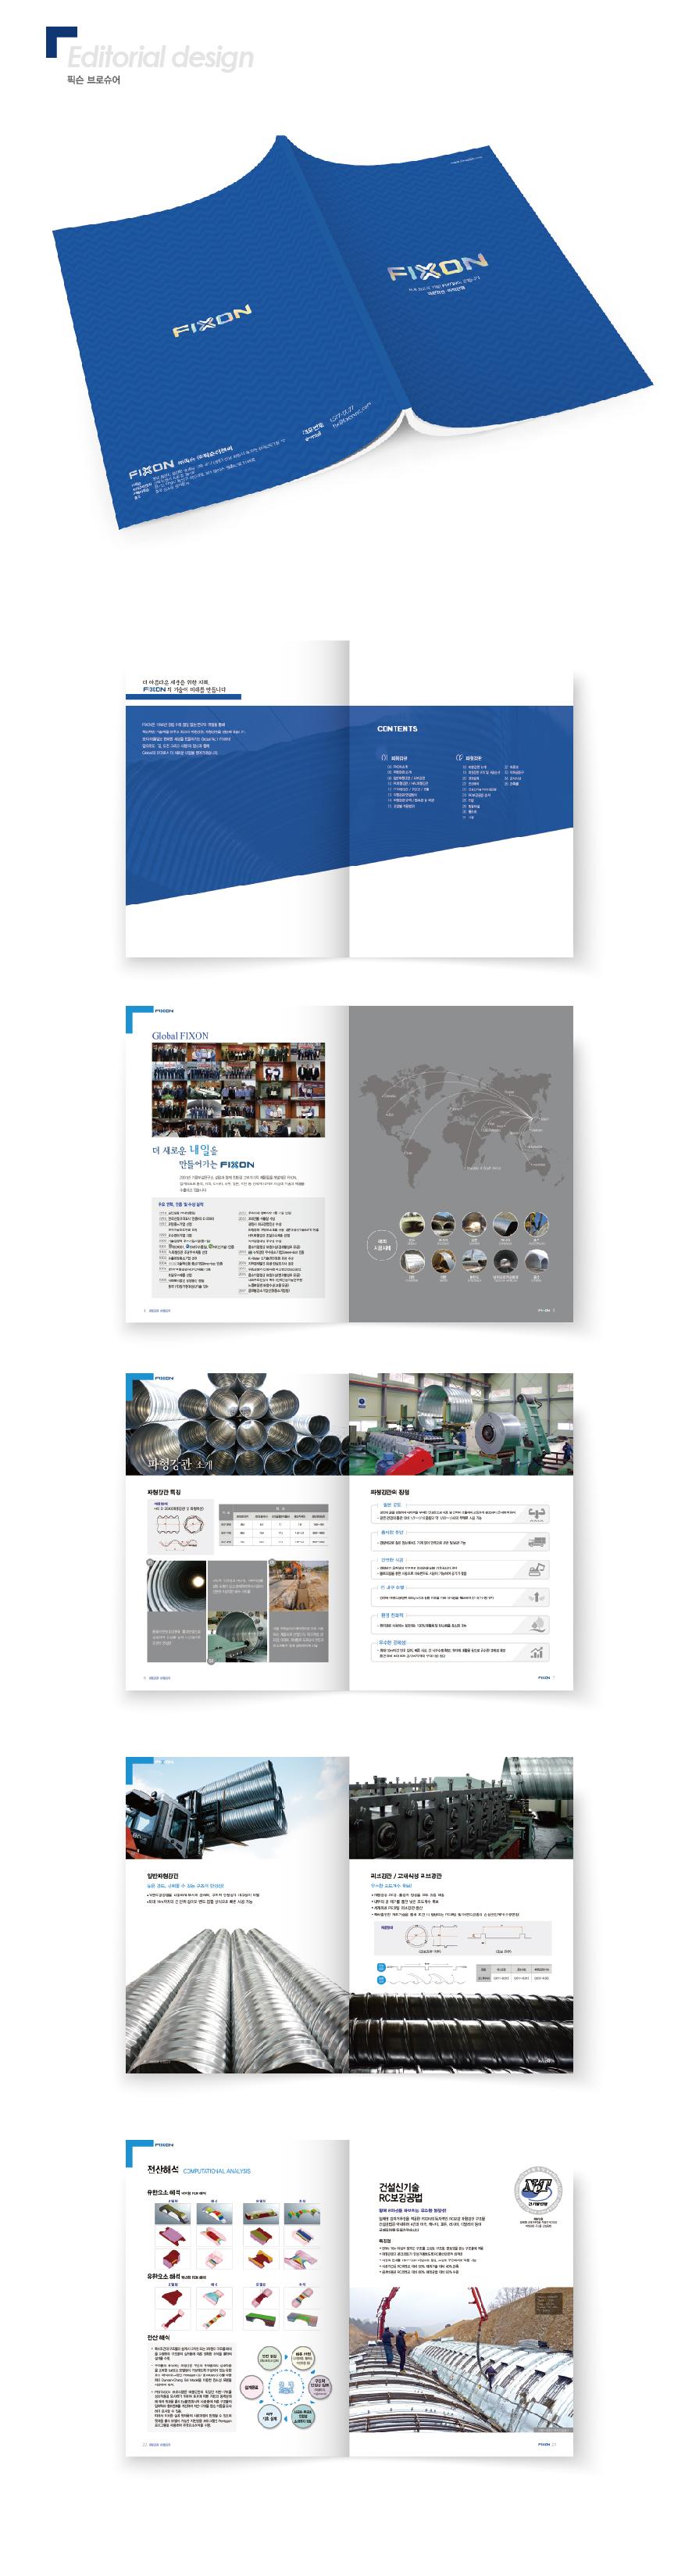 02 Editorial design-06.jpg